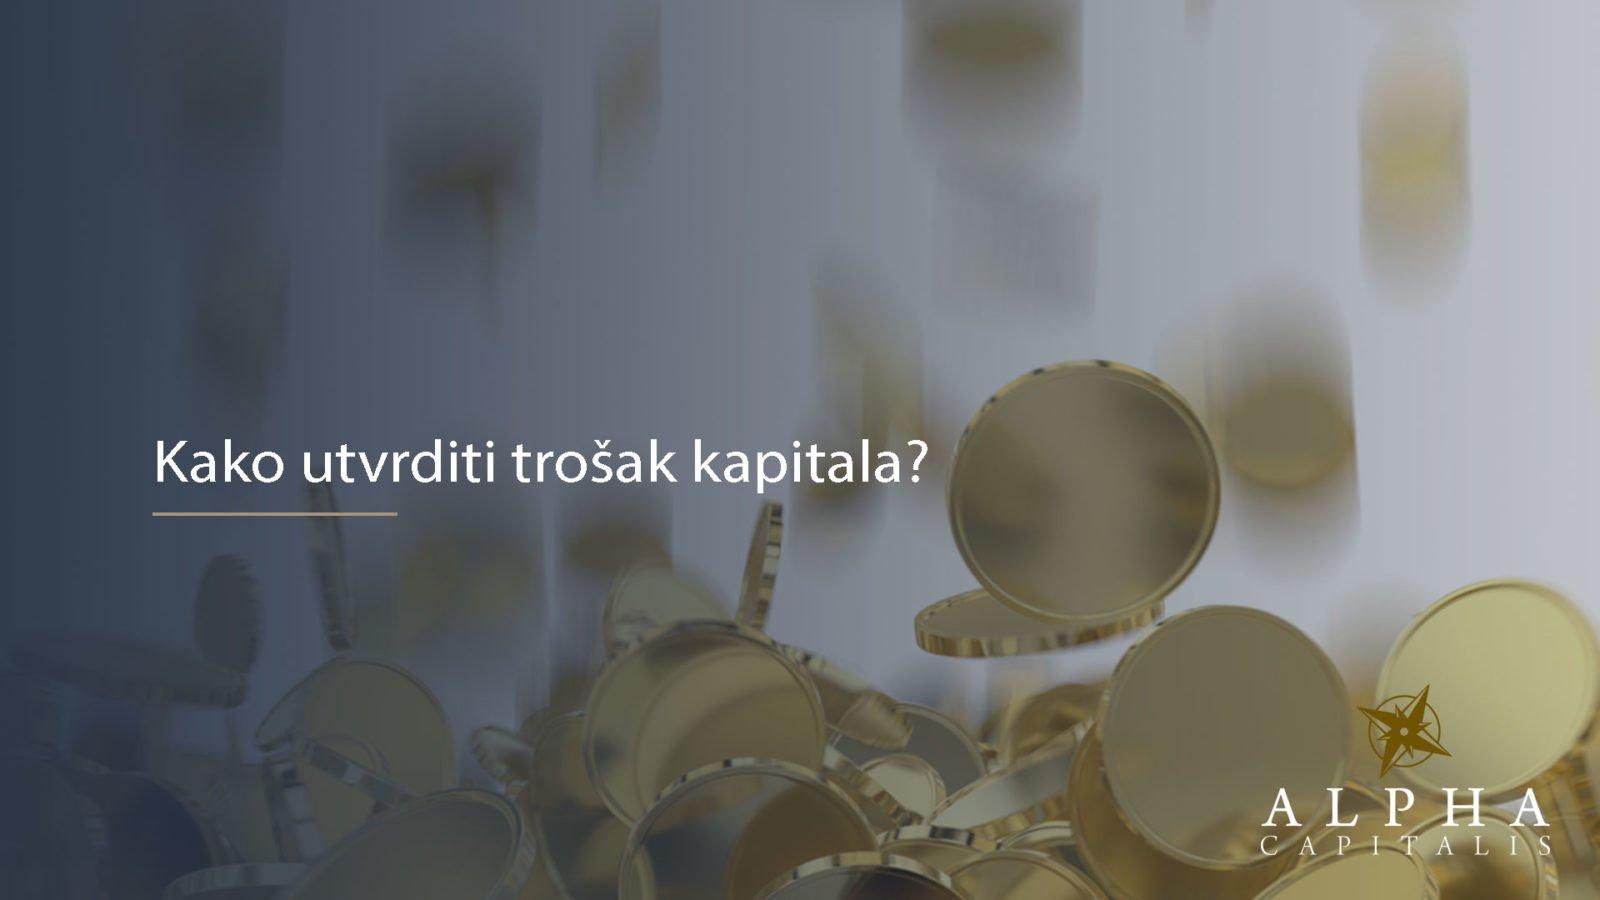 Trošak kapitala 2019 06 26 - Kako utvrditi trošak kapitala?